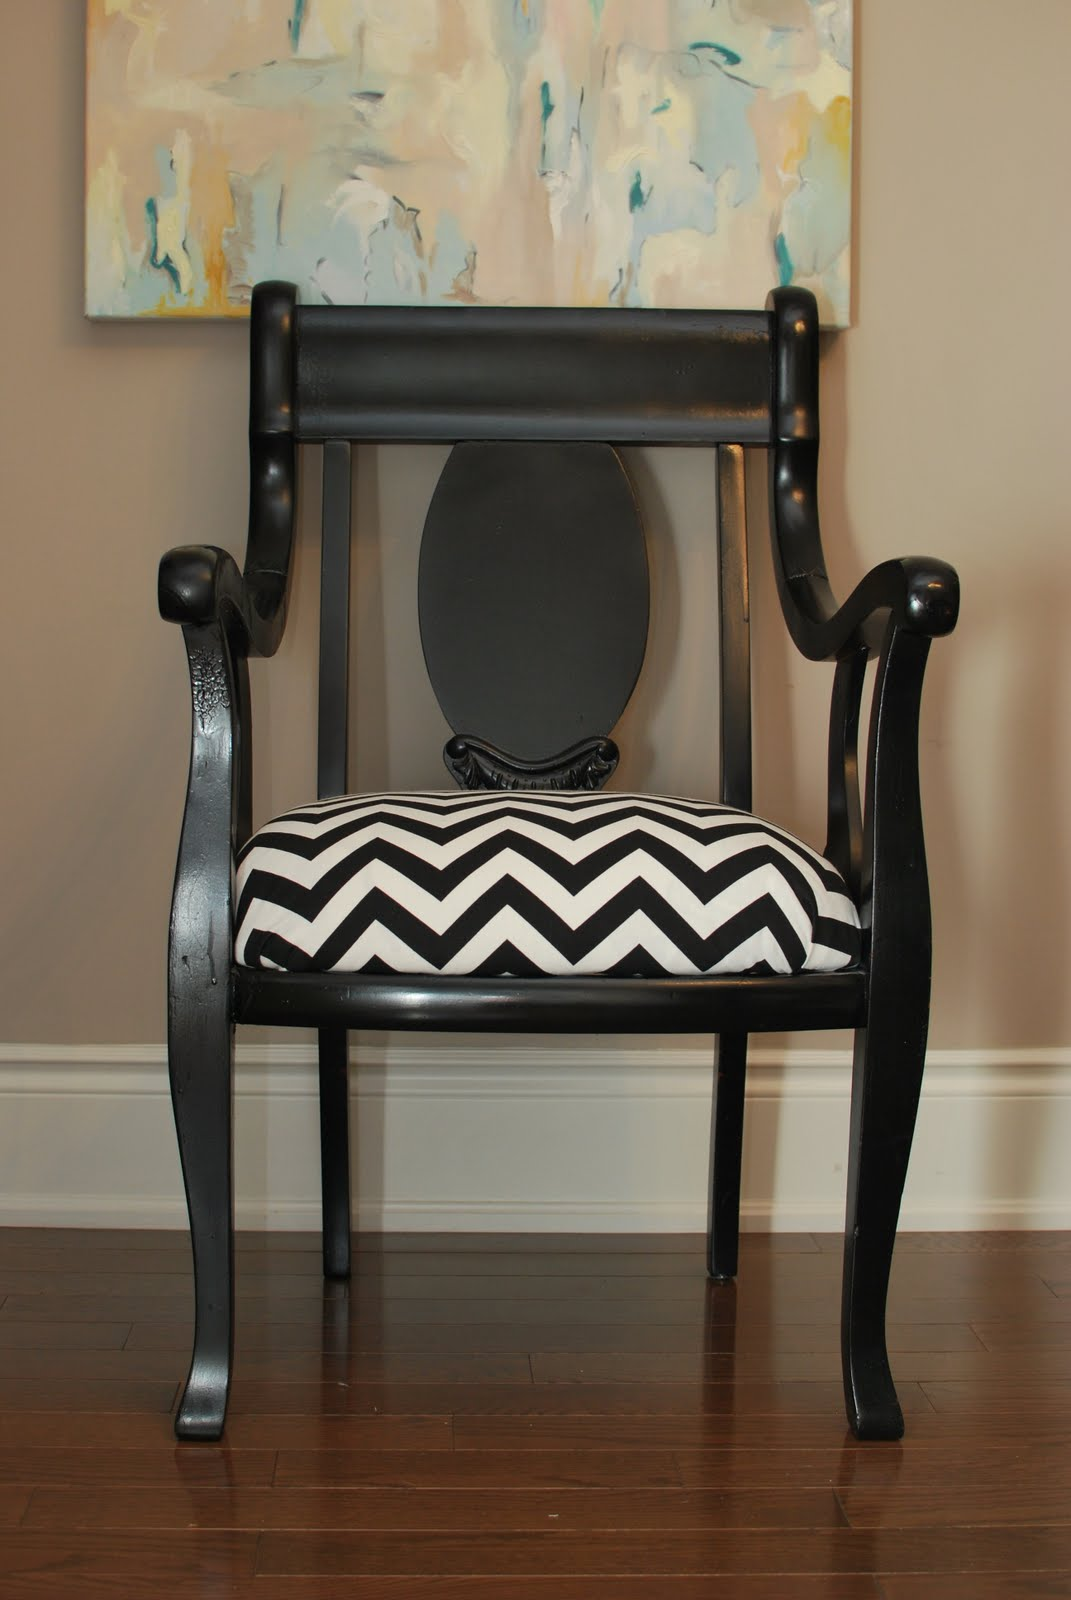 https://i0.wp.com/4.bp.blogspot.com/_Cq9ZHL9A6G0/THL0-mdhiRI/AAAAAAAAE04/uUITKsZ7peo/s1600/diy+chair+030.JPG?resize=356%2C533